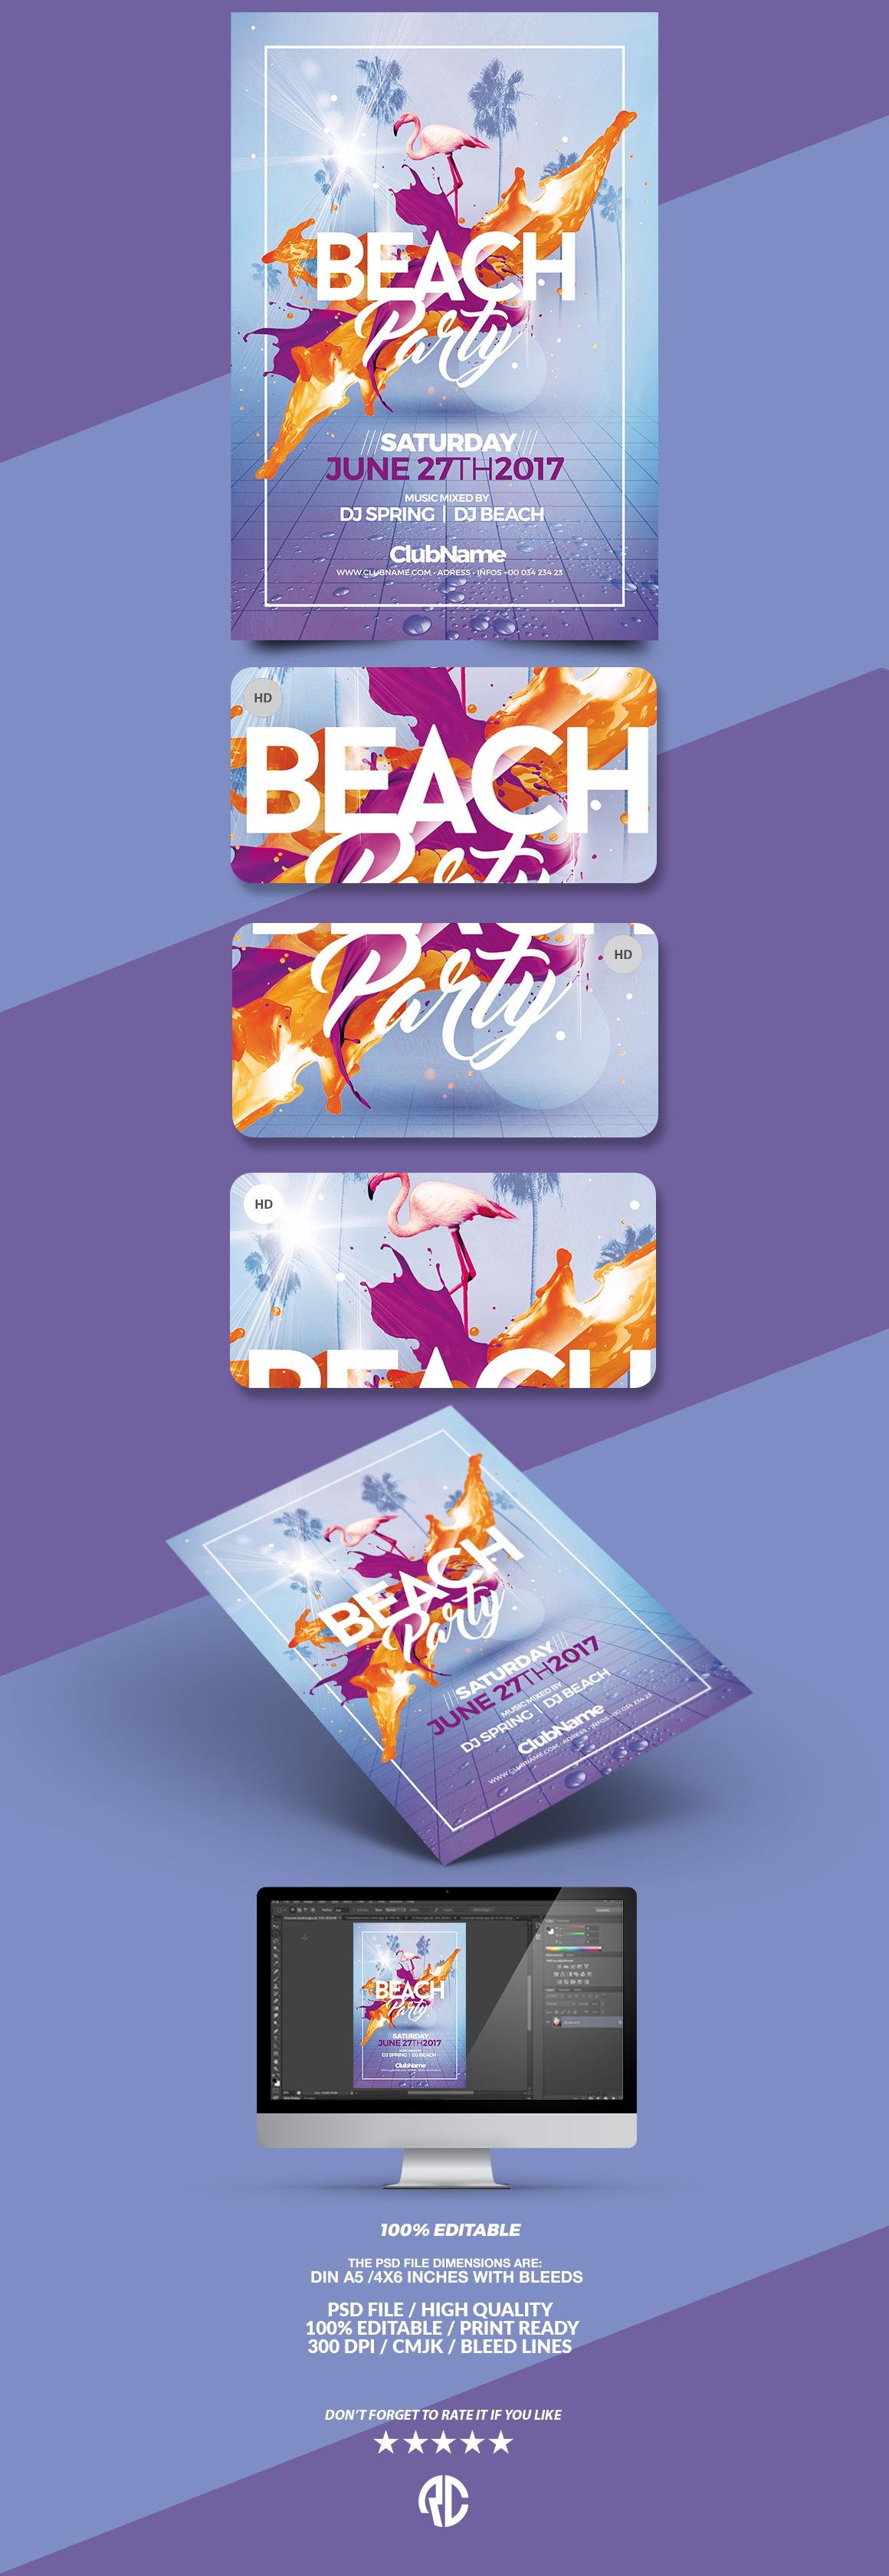 beach party psd flyer template on behance